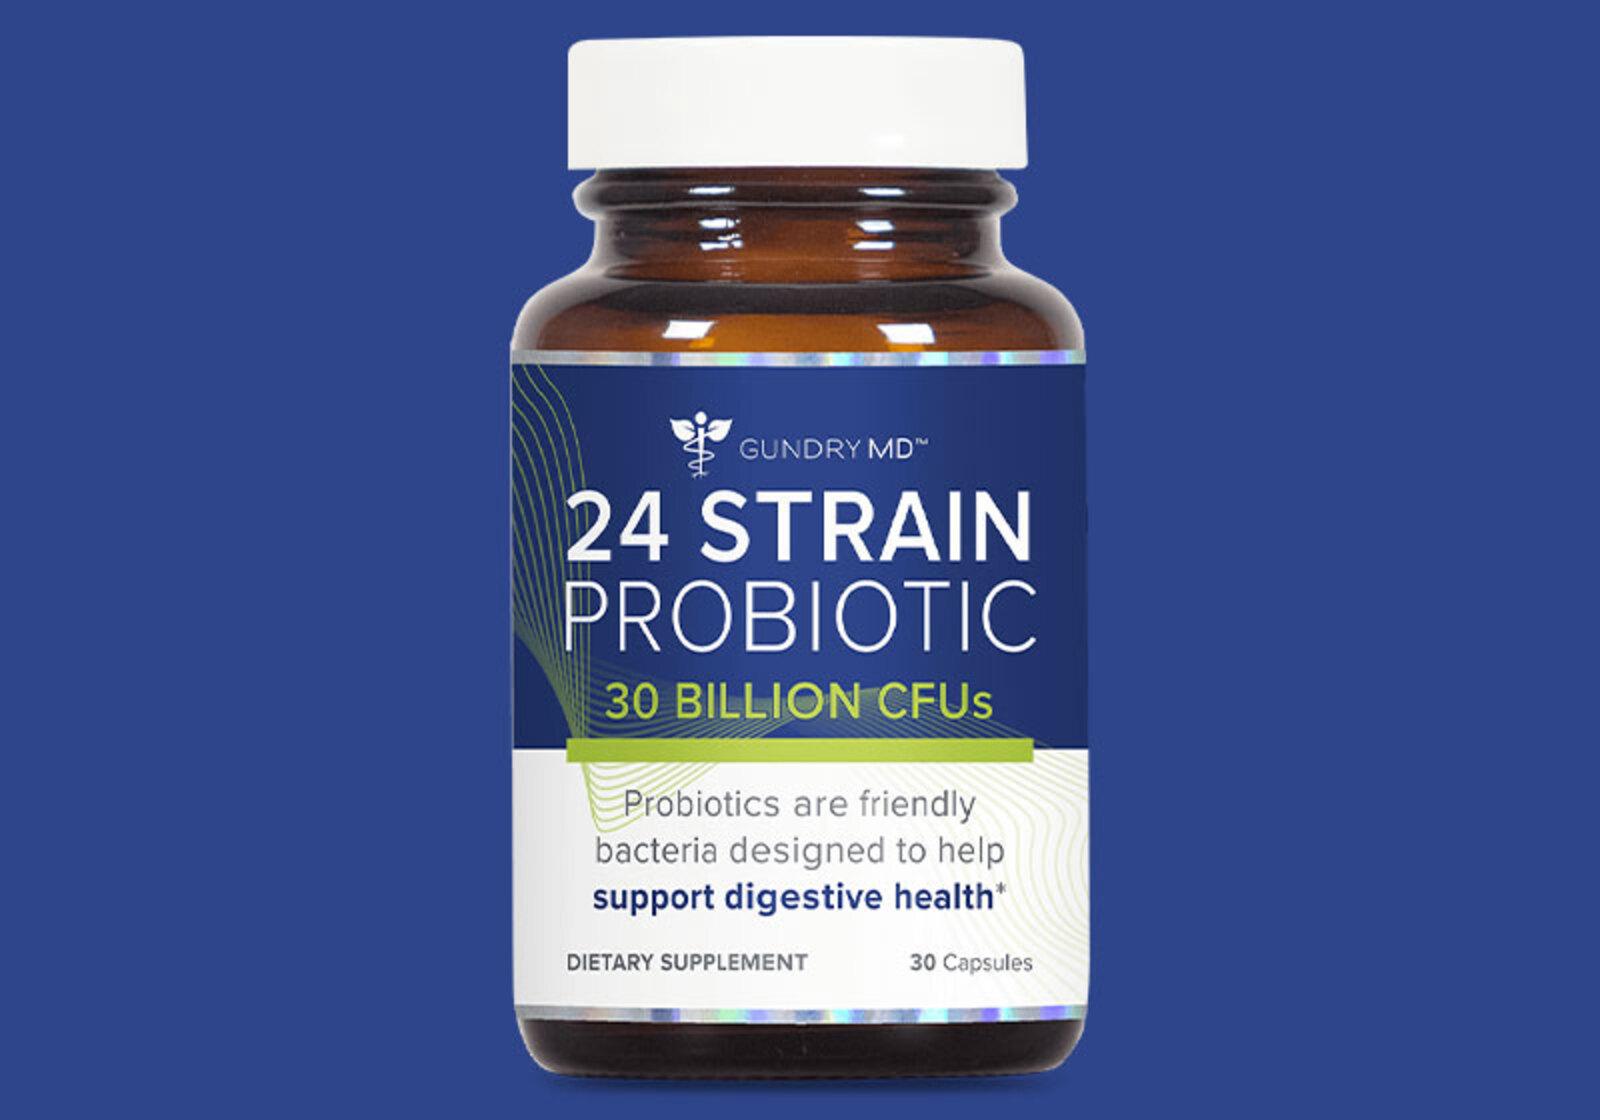 Gundry MD 24 Strain Probiotic Reviews